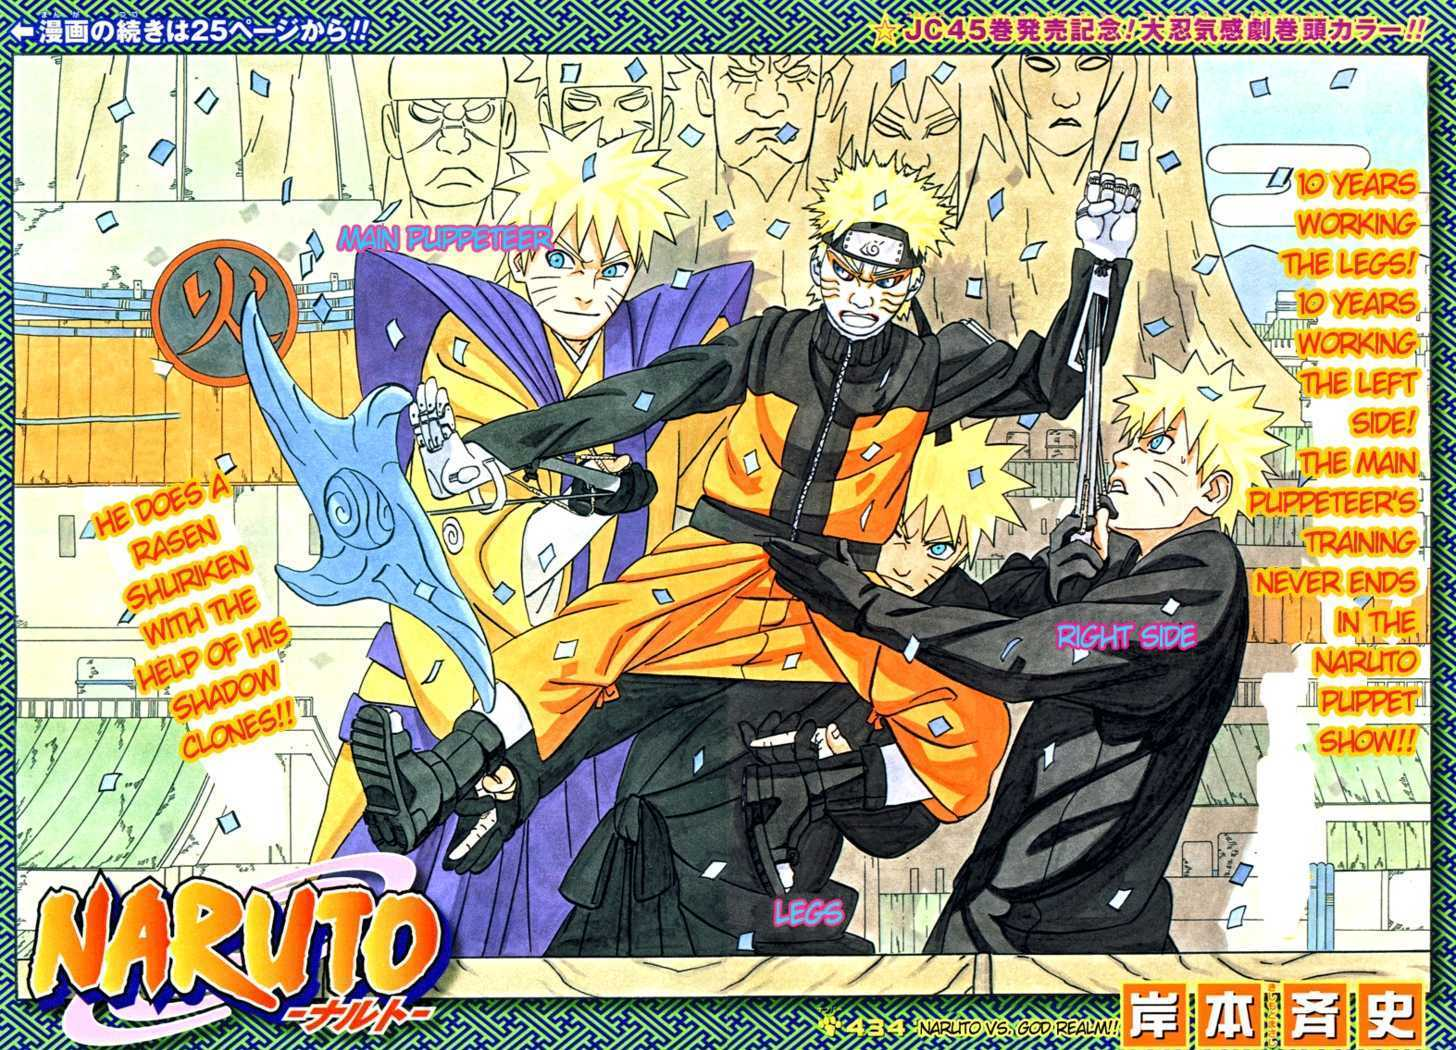 http://im.nineanime.com/comics/pic9/33/289/22835/Naruto4340179.jpg Page 1